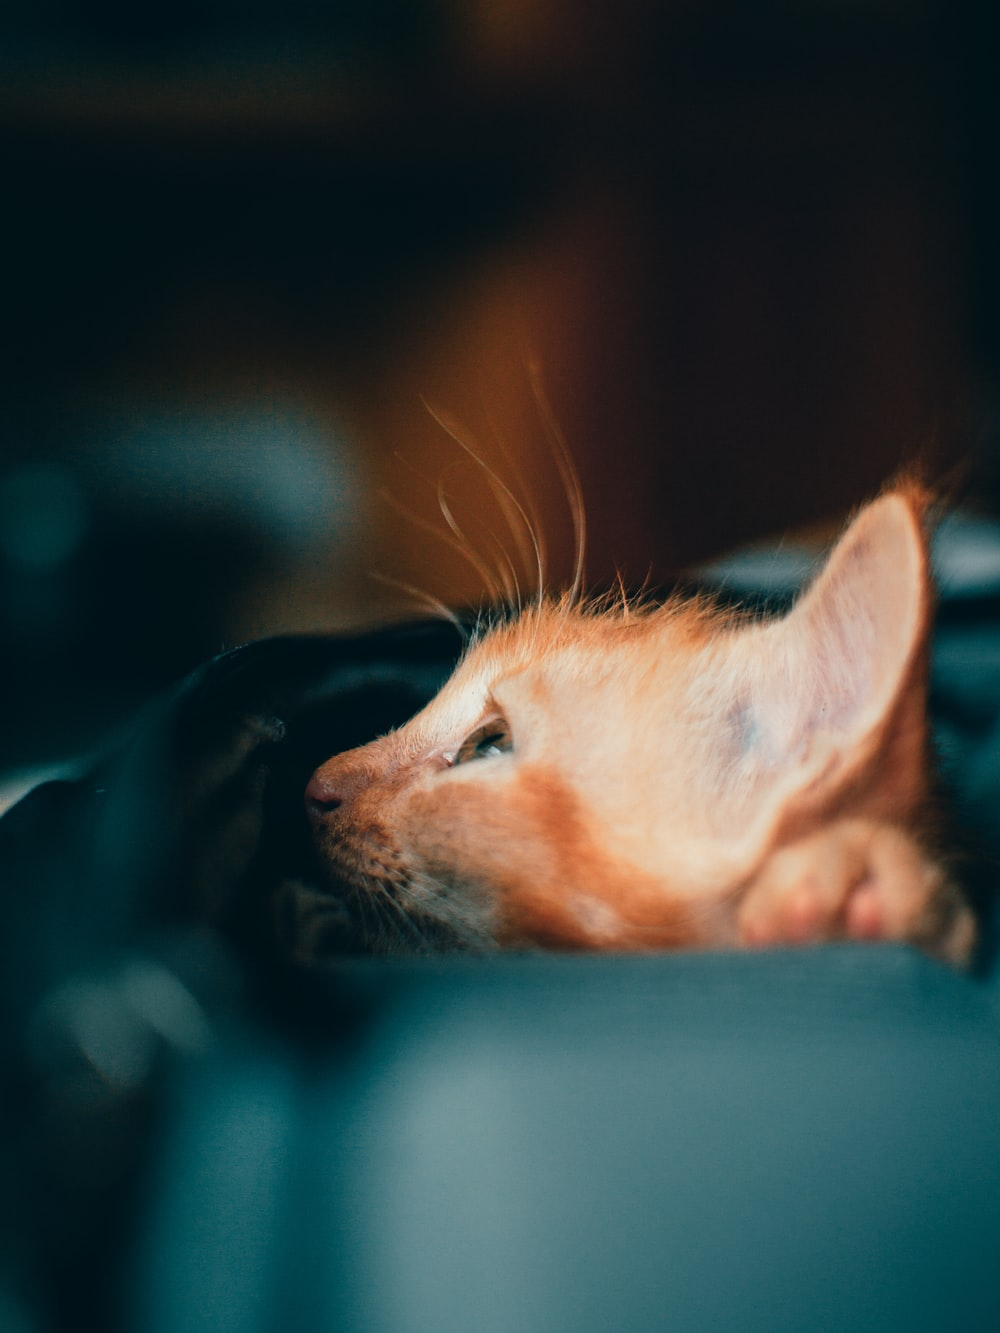 orange tabby cat lying on blue textile